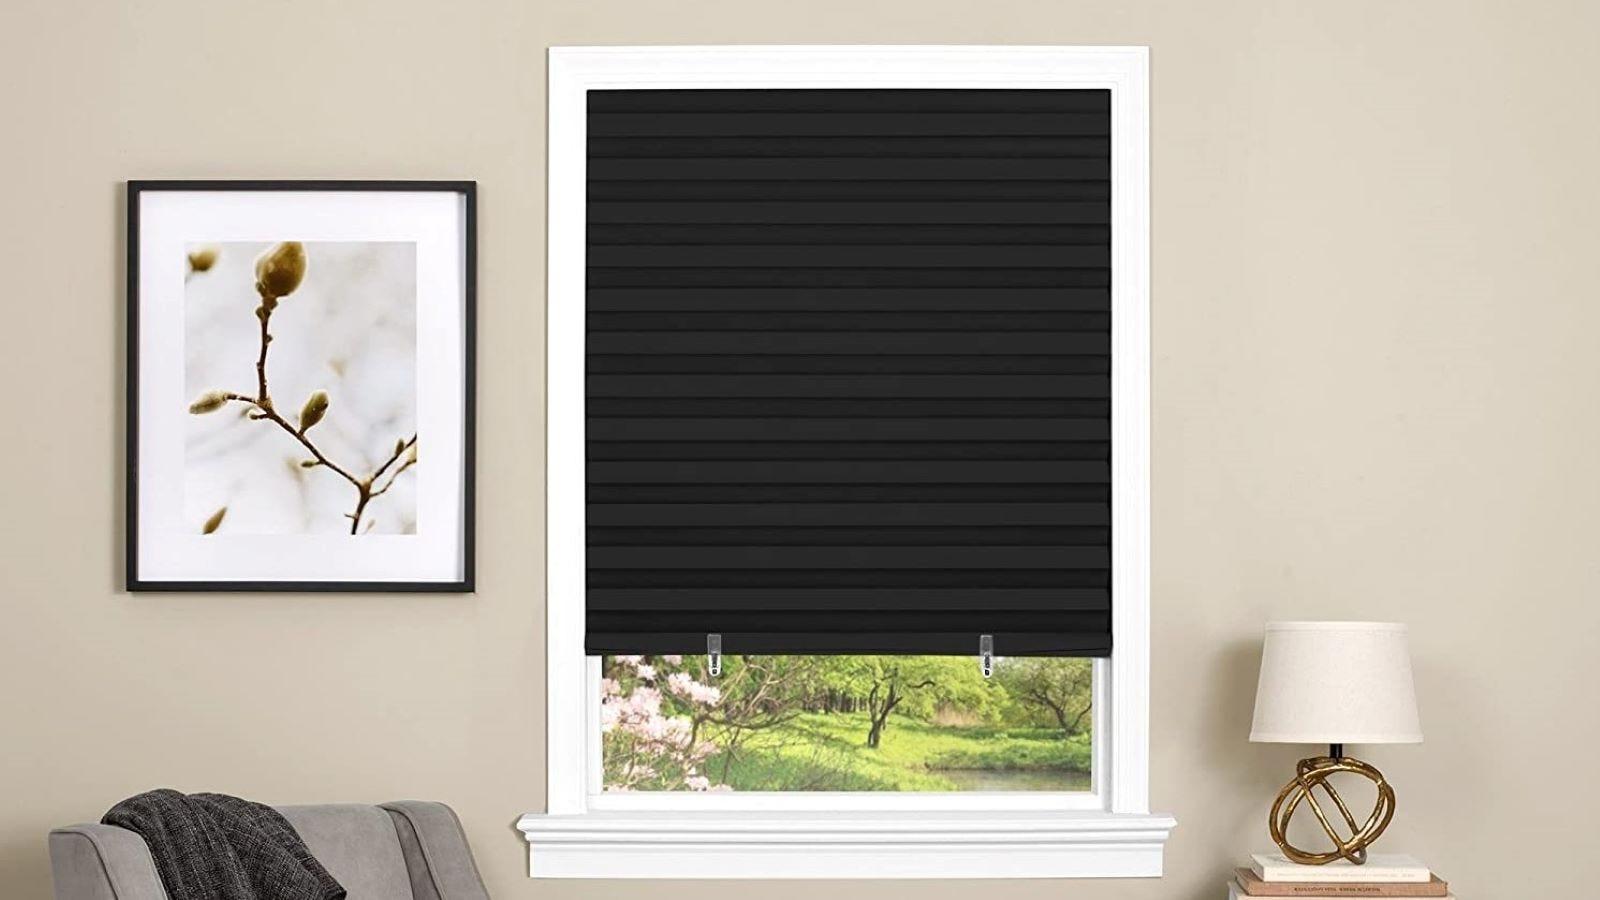 Achim Home Black Vinyl Room Darkening Pleated Window Shade on a window